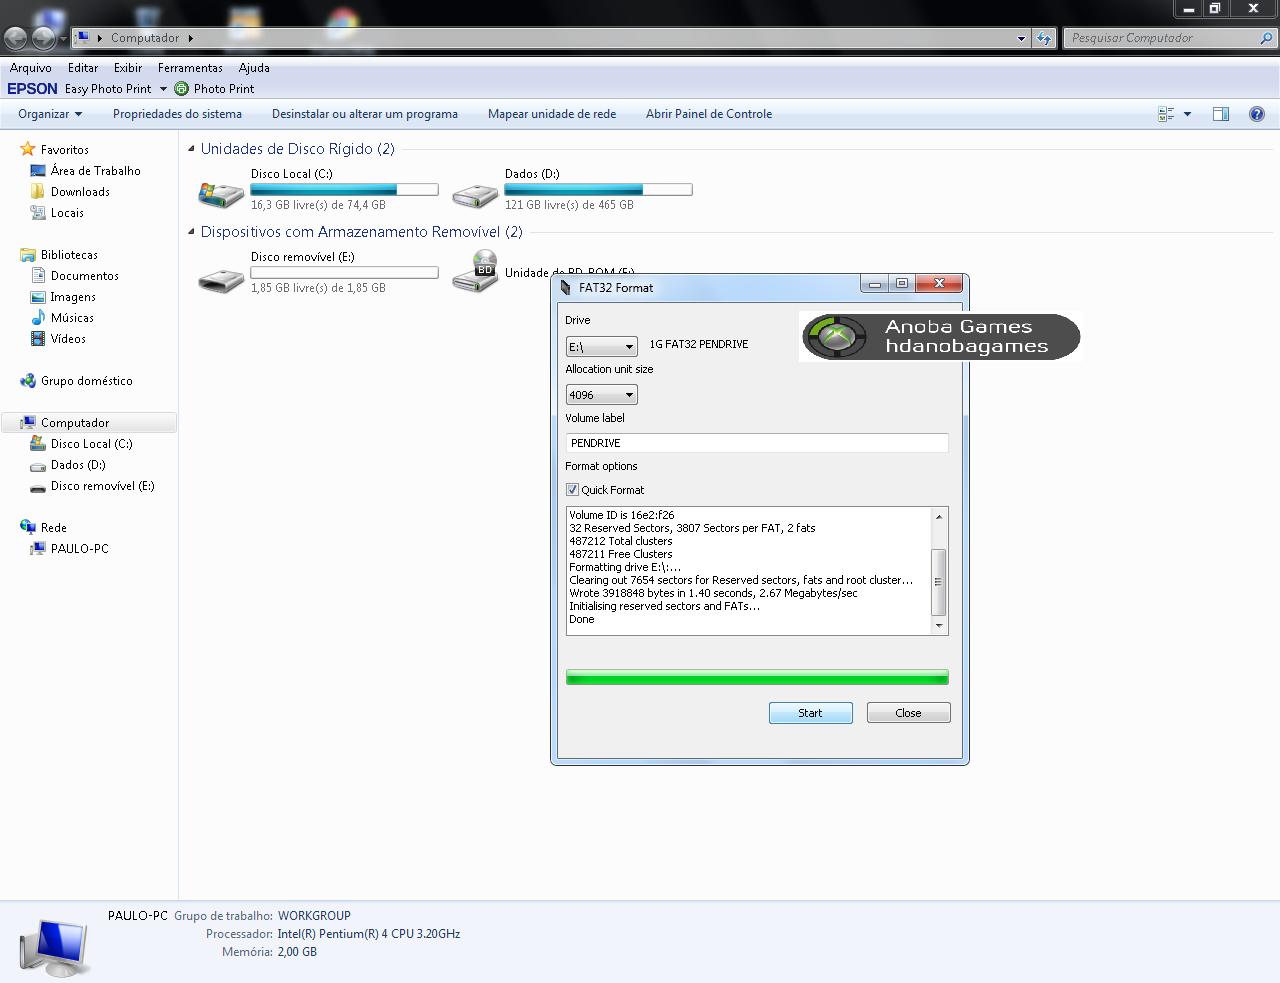 HD PARA XBOX 360 RGH / JTAG: Guia para instalar Freestyle Dash ou